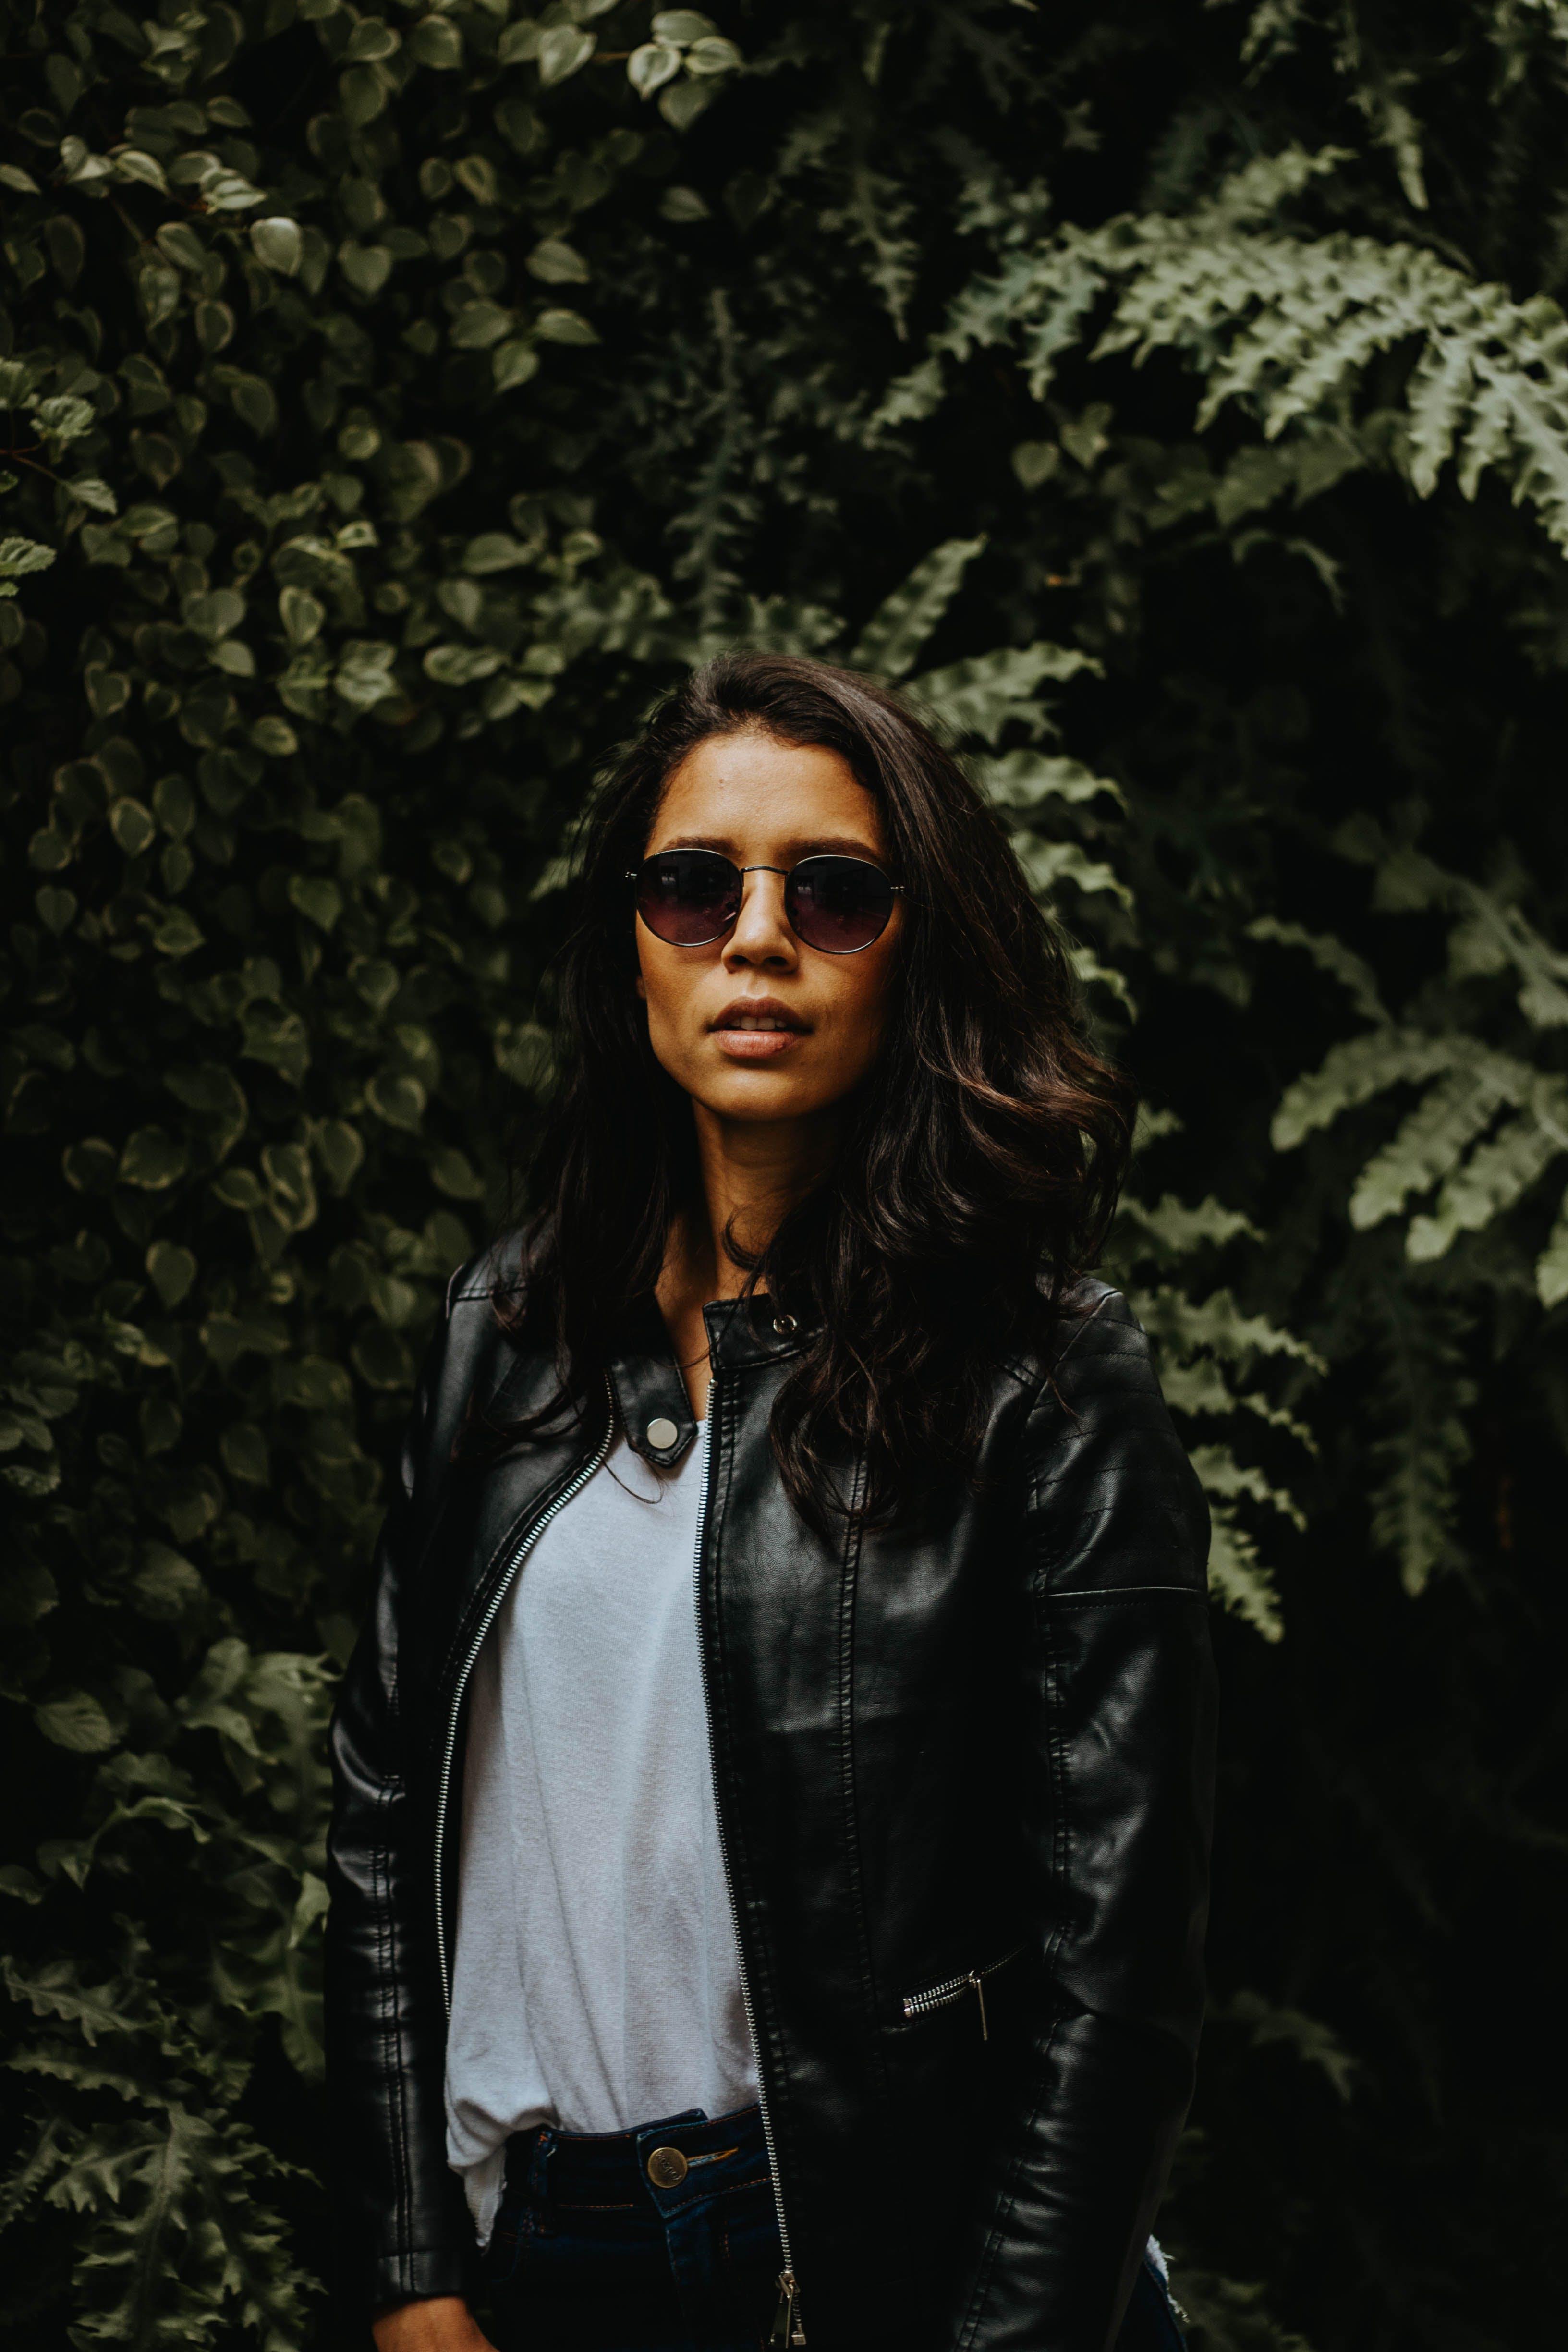 Women's Black Leather Zip-up Jacket